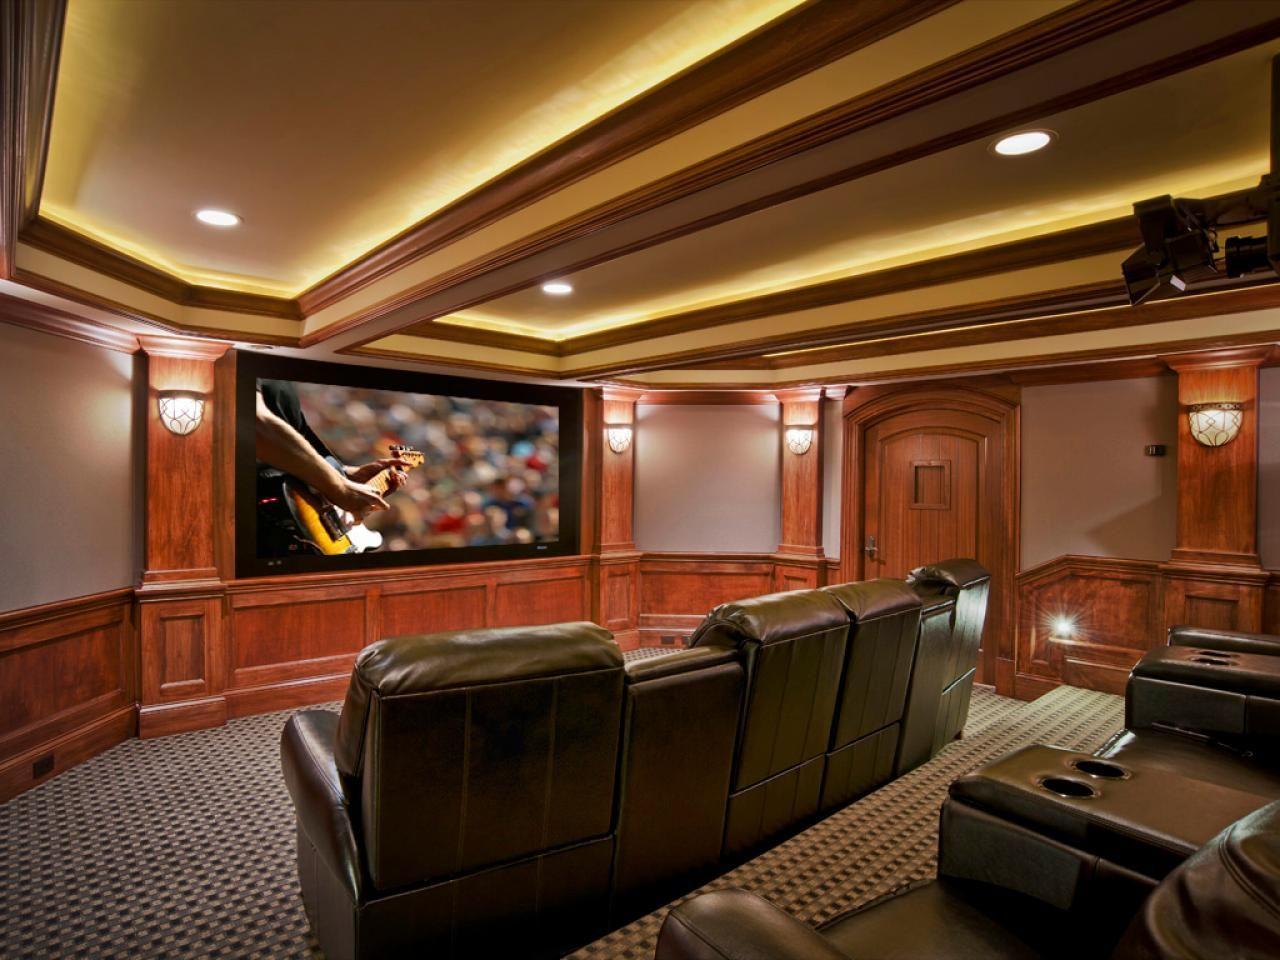 Basement home theater ideas, DIY, small spaces, budget, medium ...